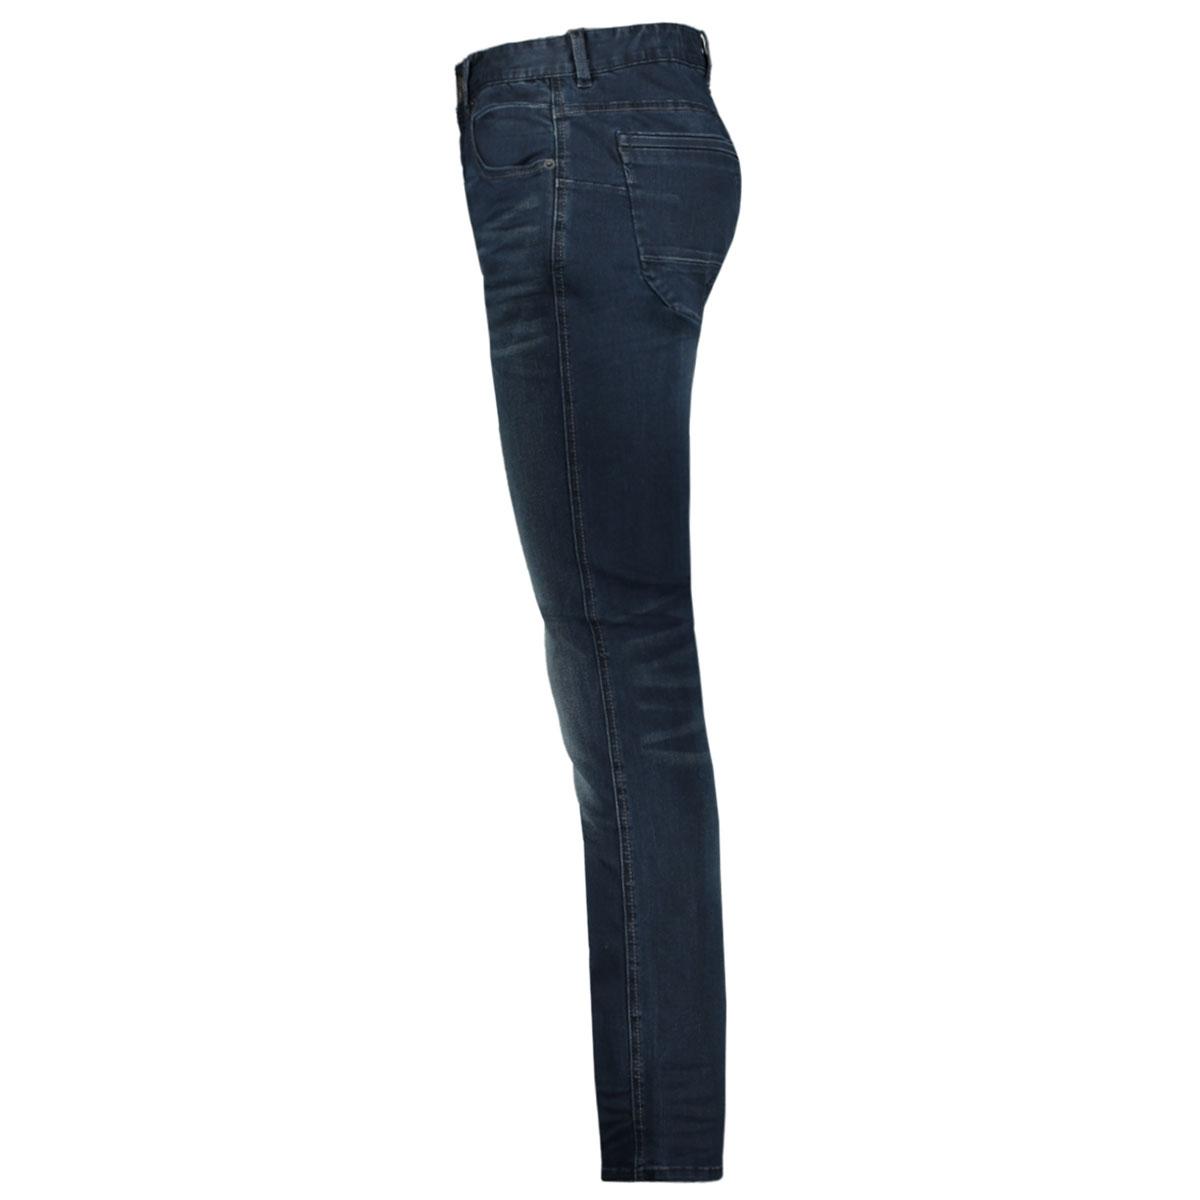 nightflight ptr120 pme legend jeans lmb